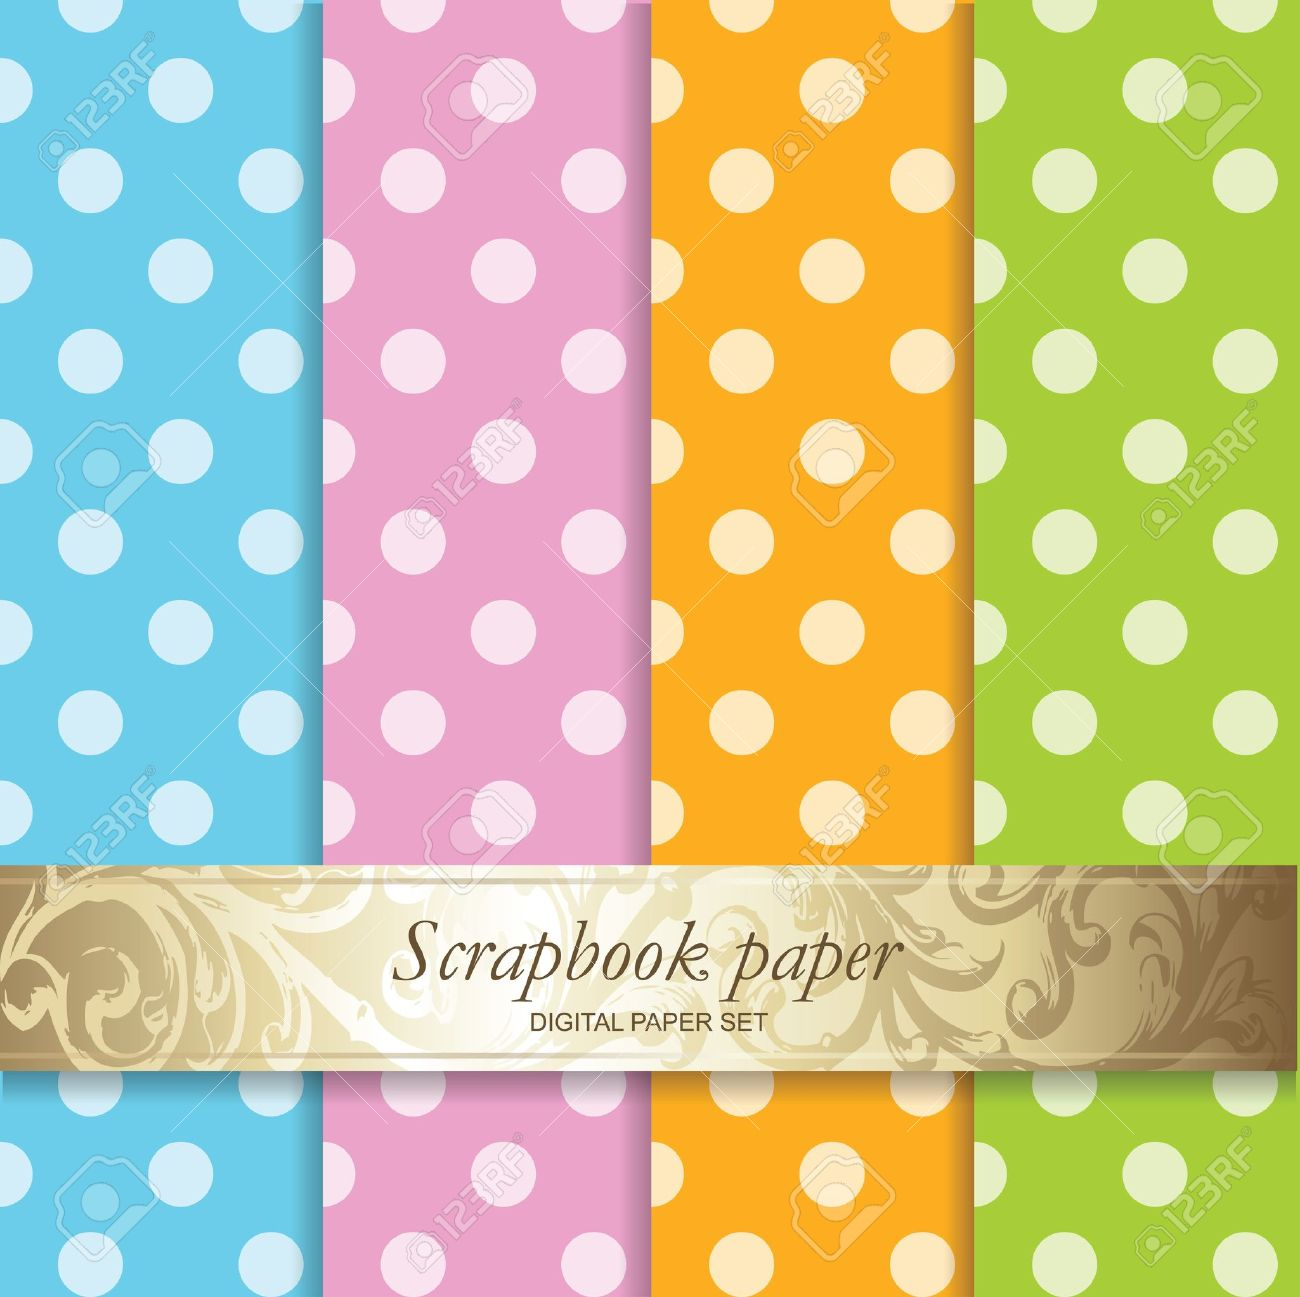 Scrapbook paper images - Colorful Backgrounds Set Scrapbook Paper Stock Vector 15428131